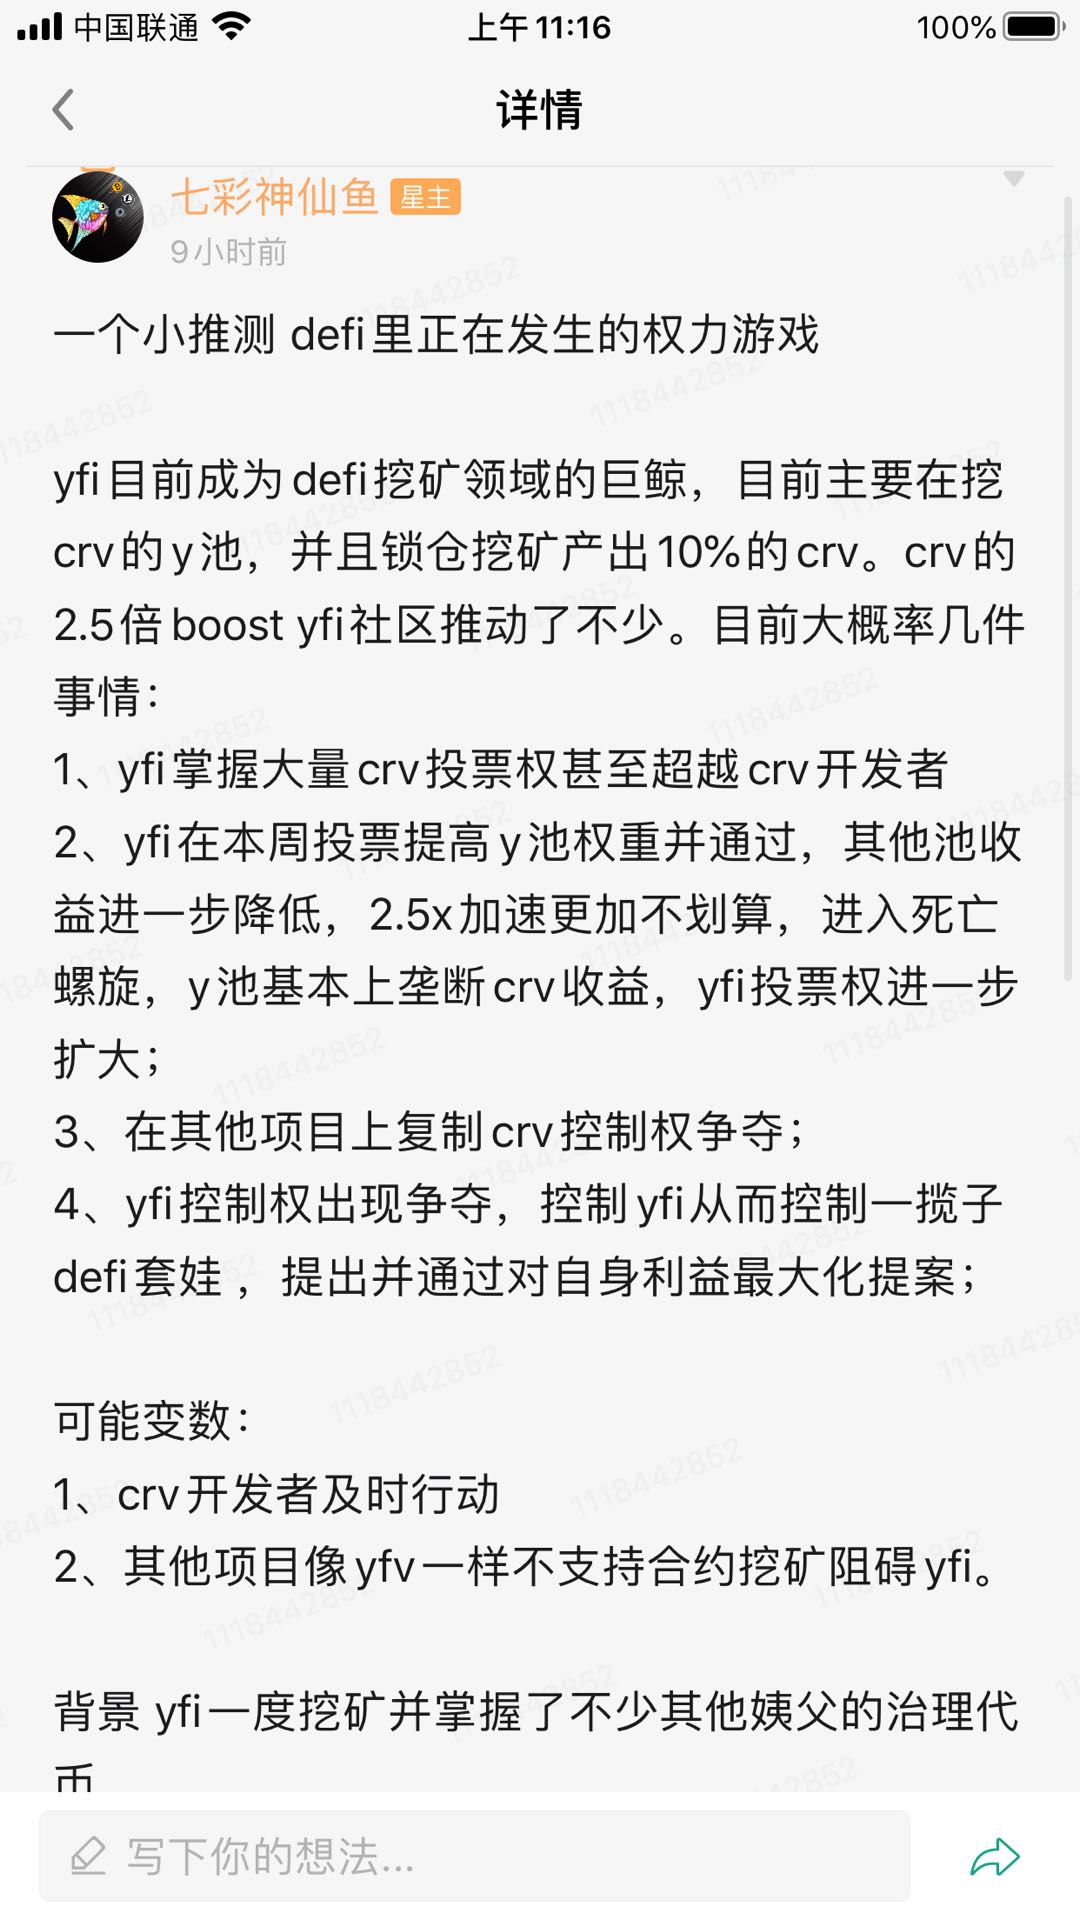 YFI与YFII的强联动效应分析:多快好省的策略